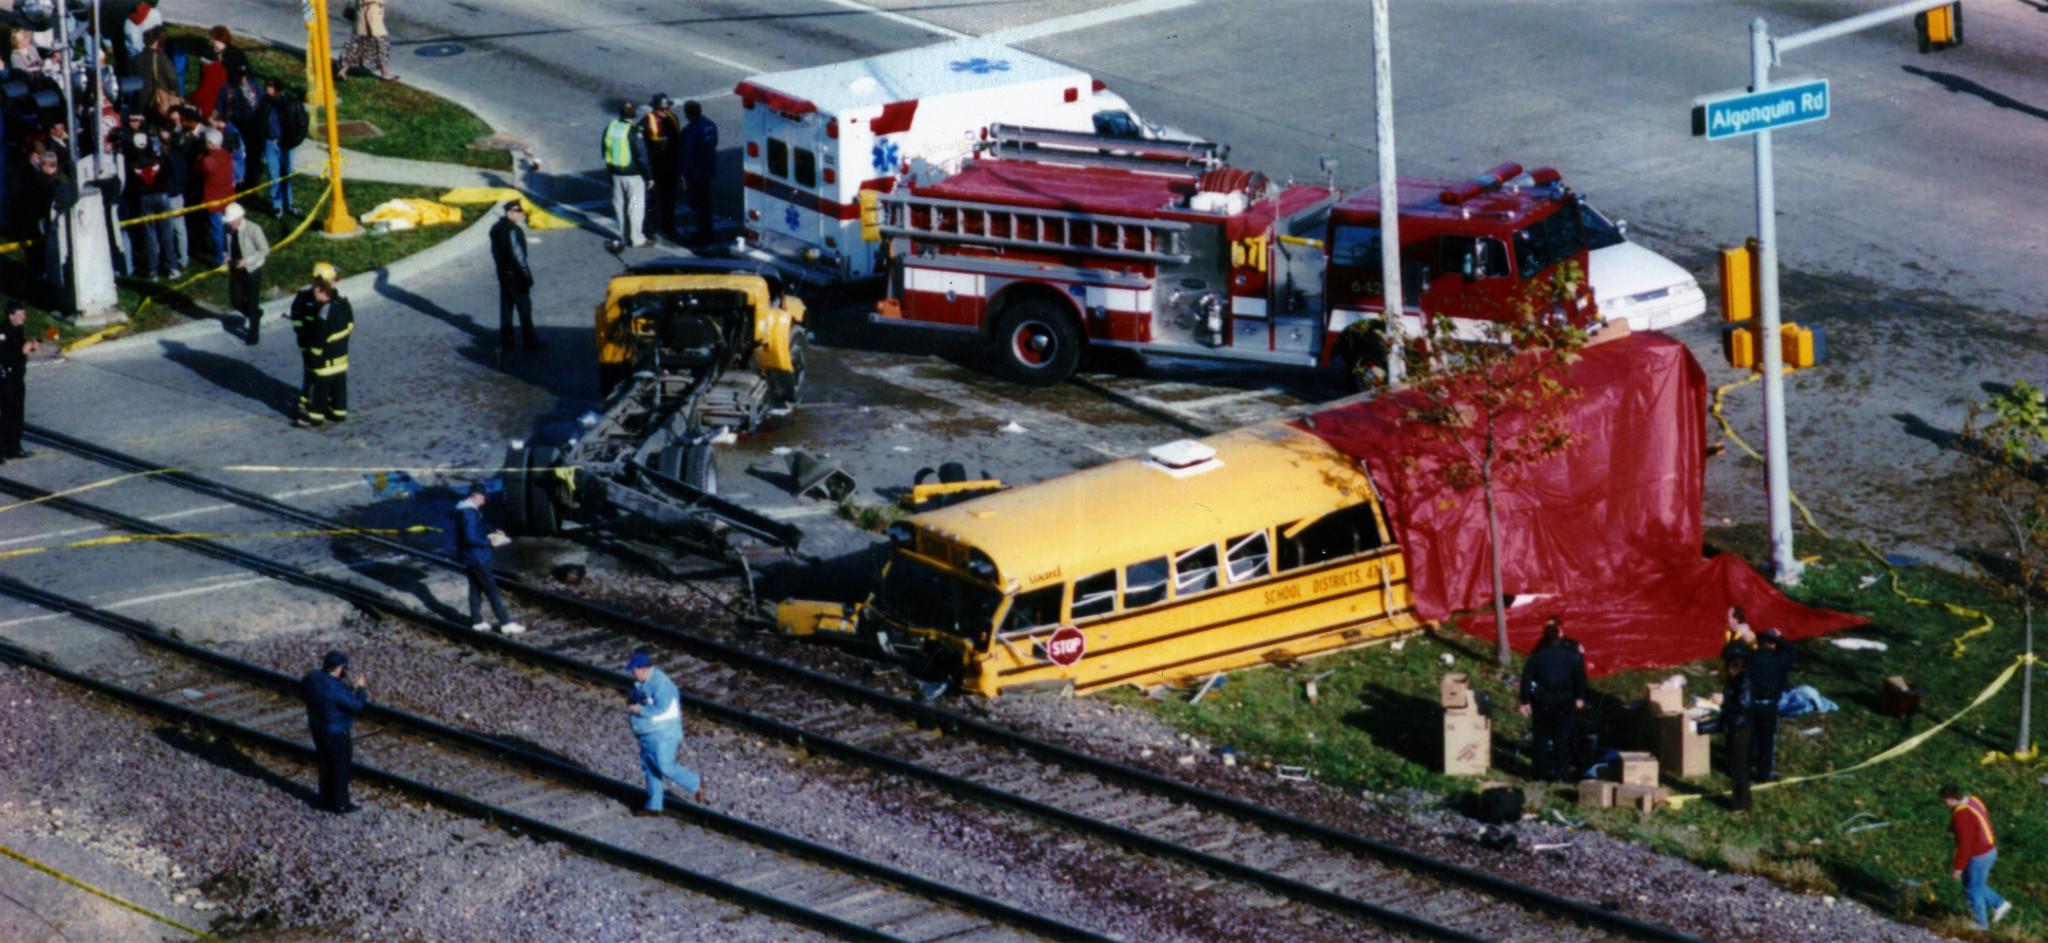 20th anniversary of fatal bus-train crash - Chicago Tribune